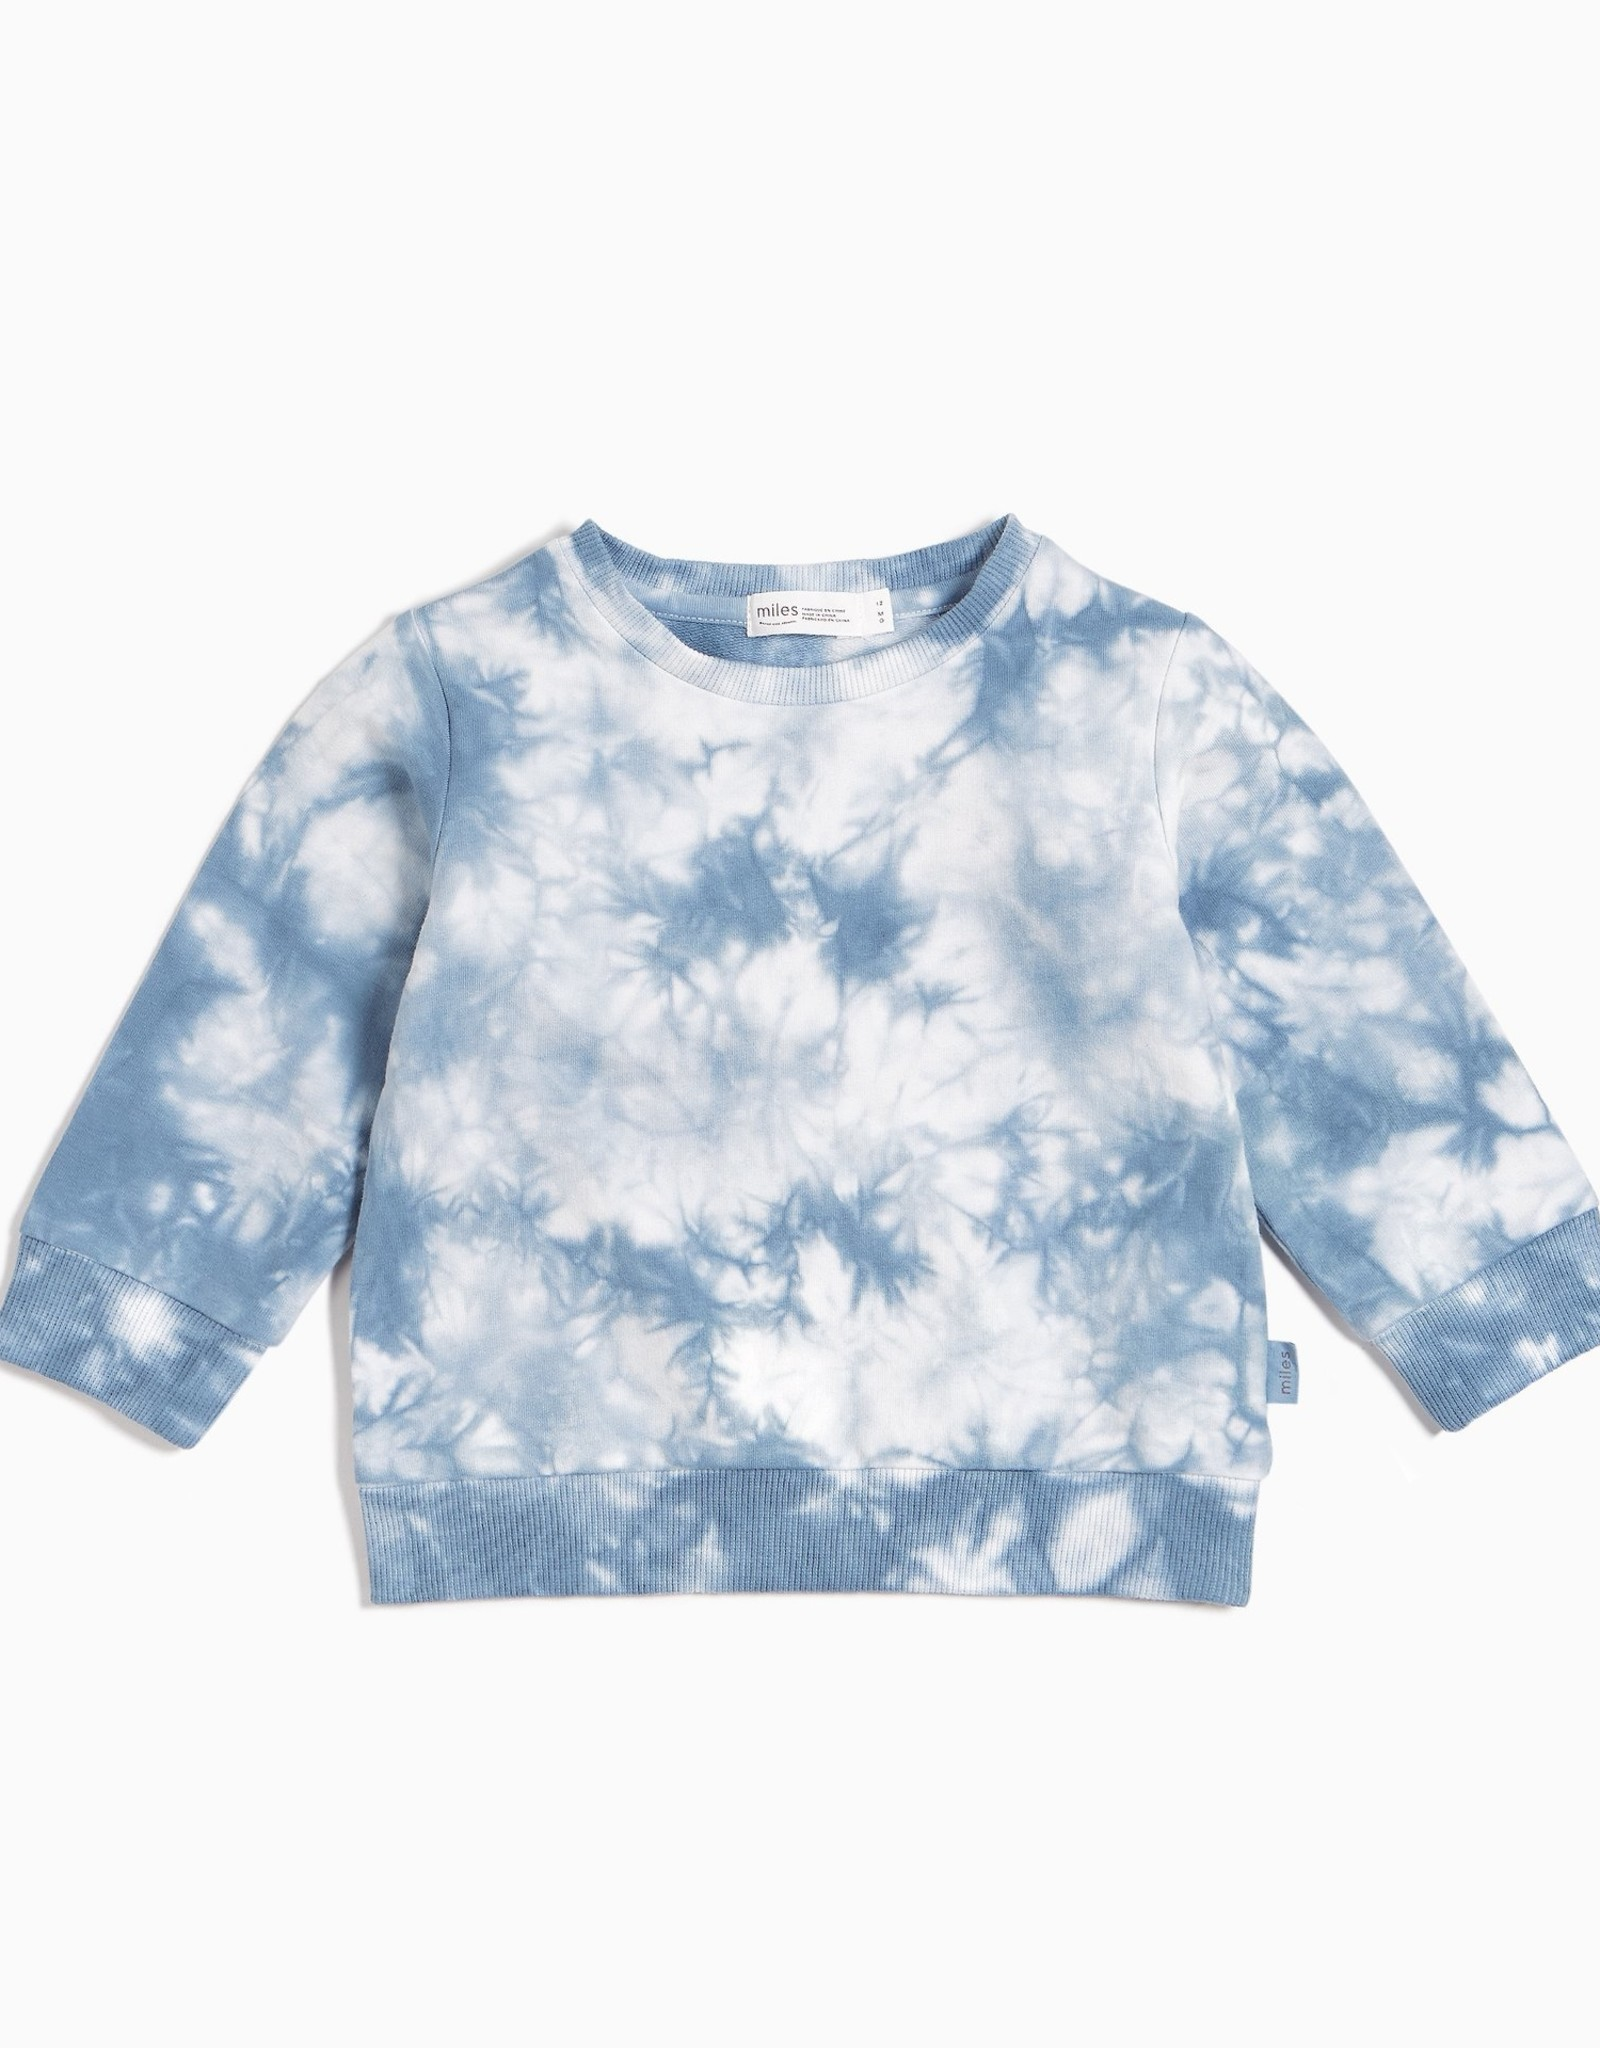 Miles SP21 Blue Tye Dye Sweatshirt